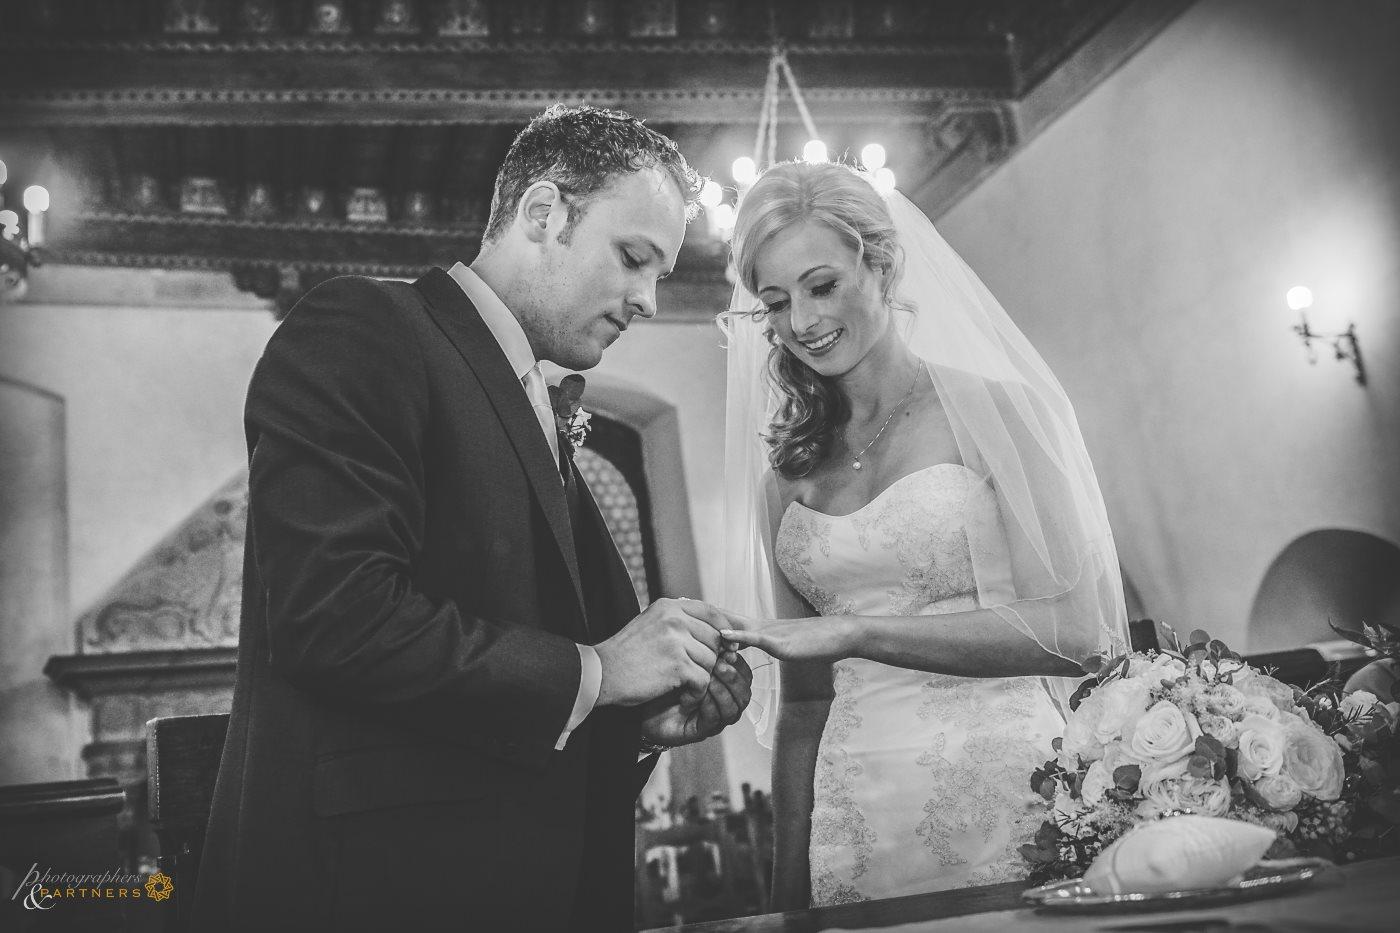 wedding_photography_cortona_09.jpg